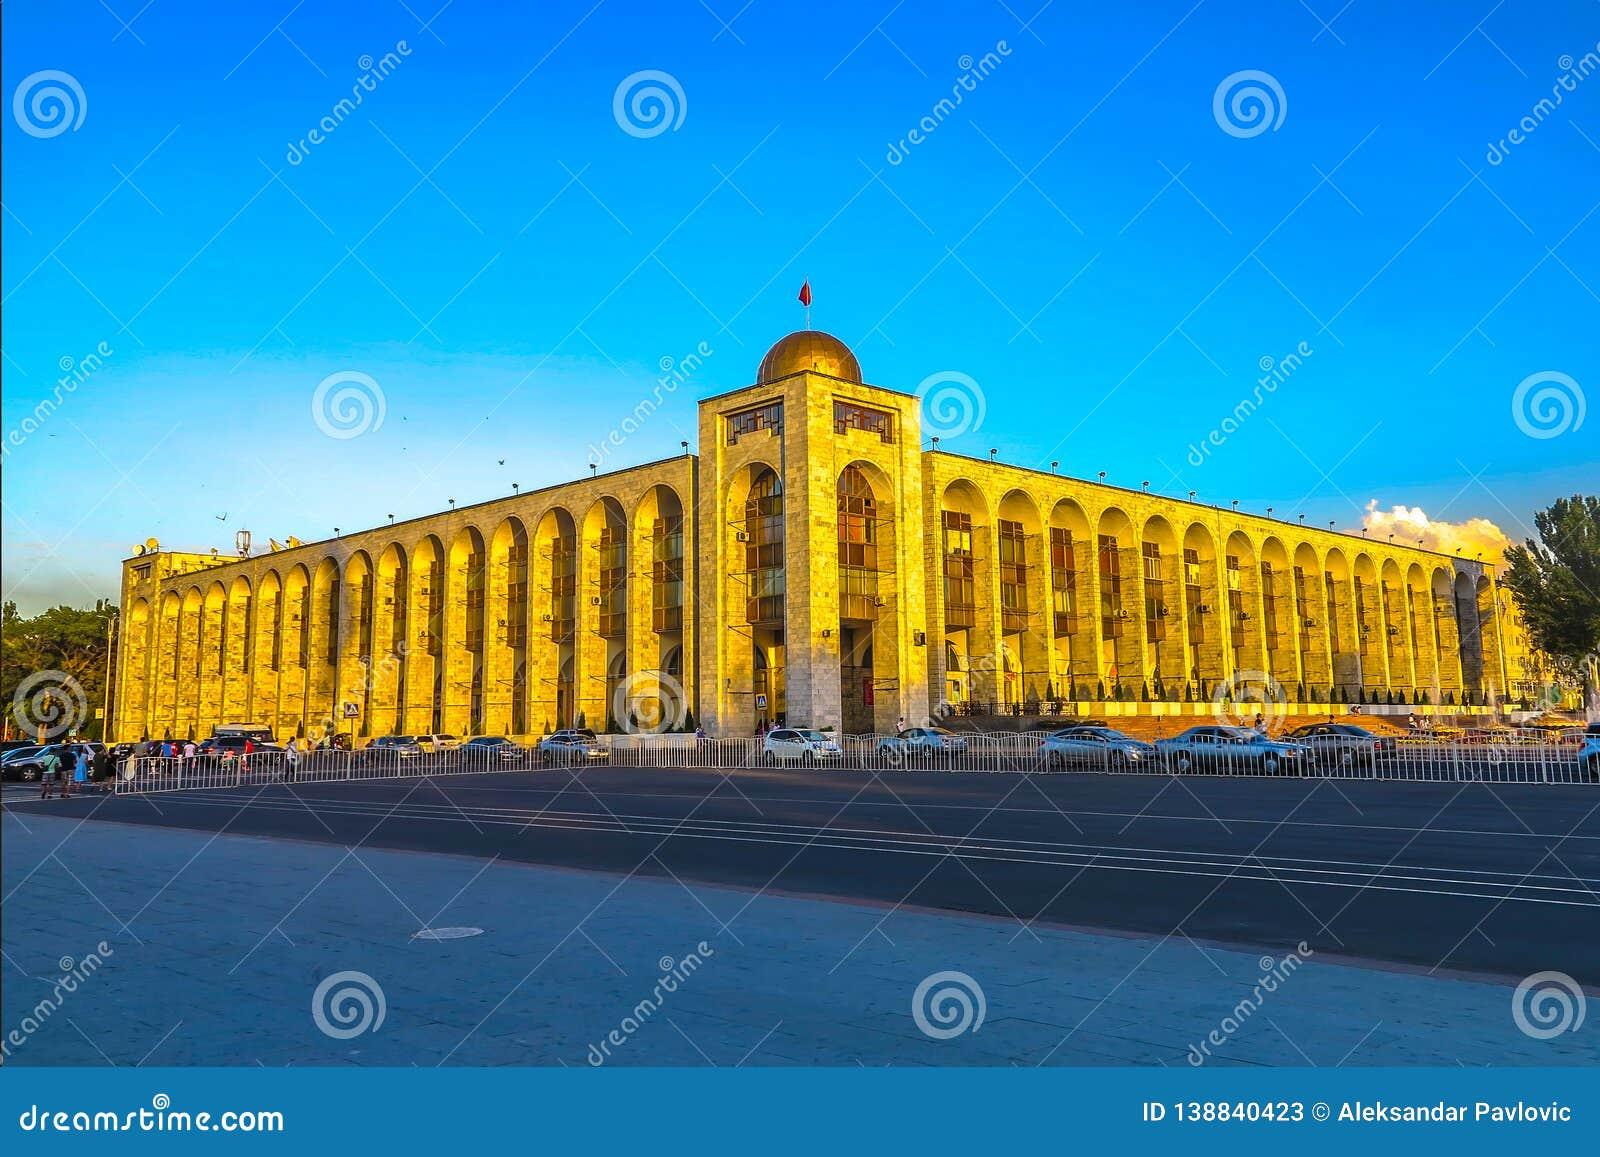 Bishkek Ala Too Square 07